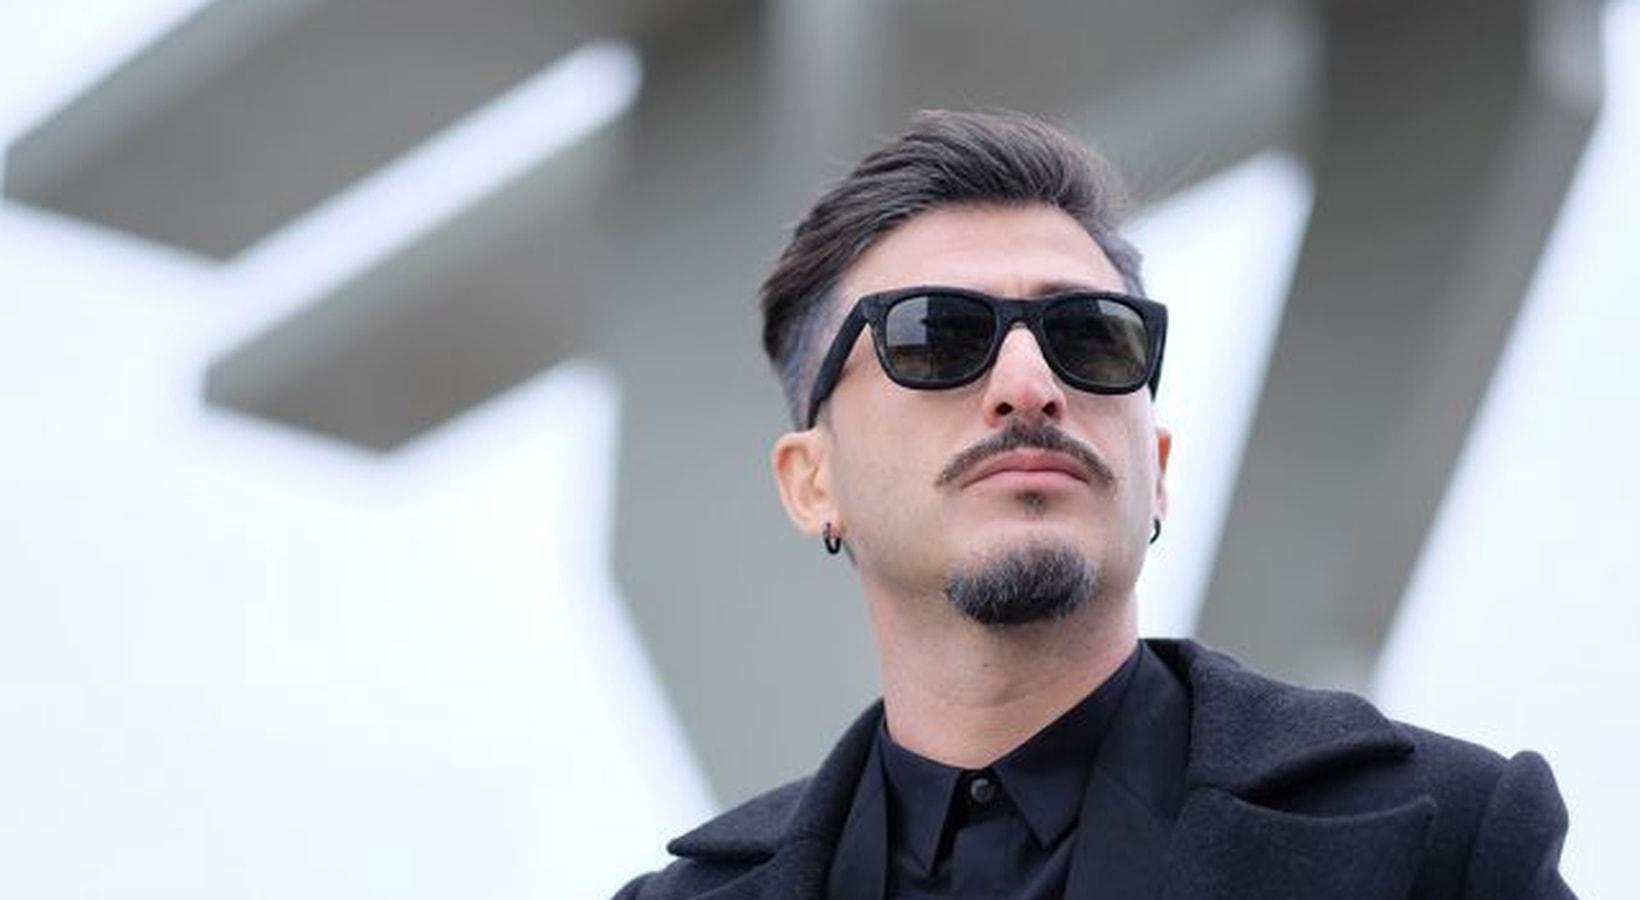 Doğan Duru, ilk solo albümü EPOCH'a ilk klibi çekti